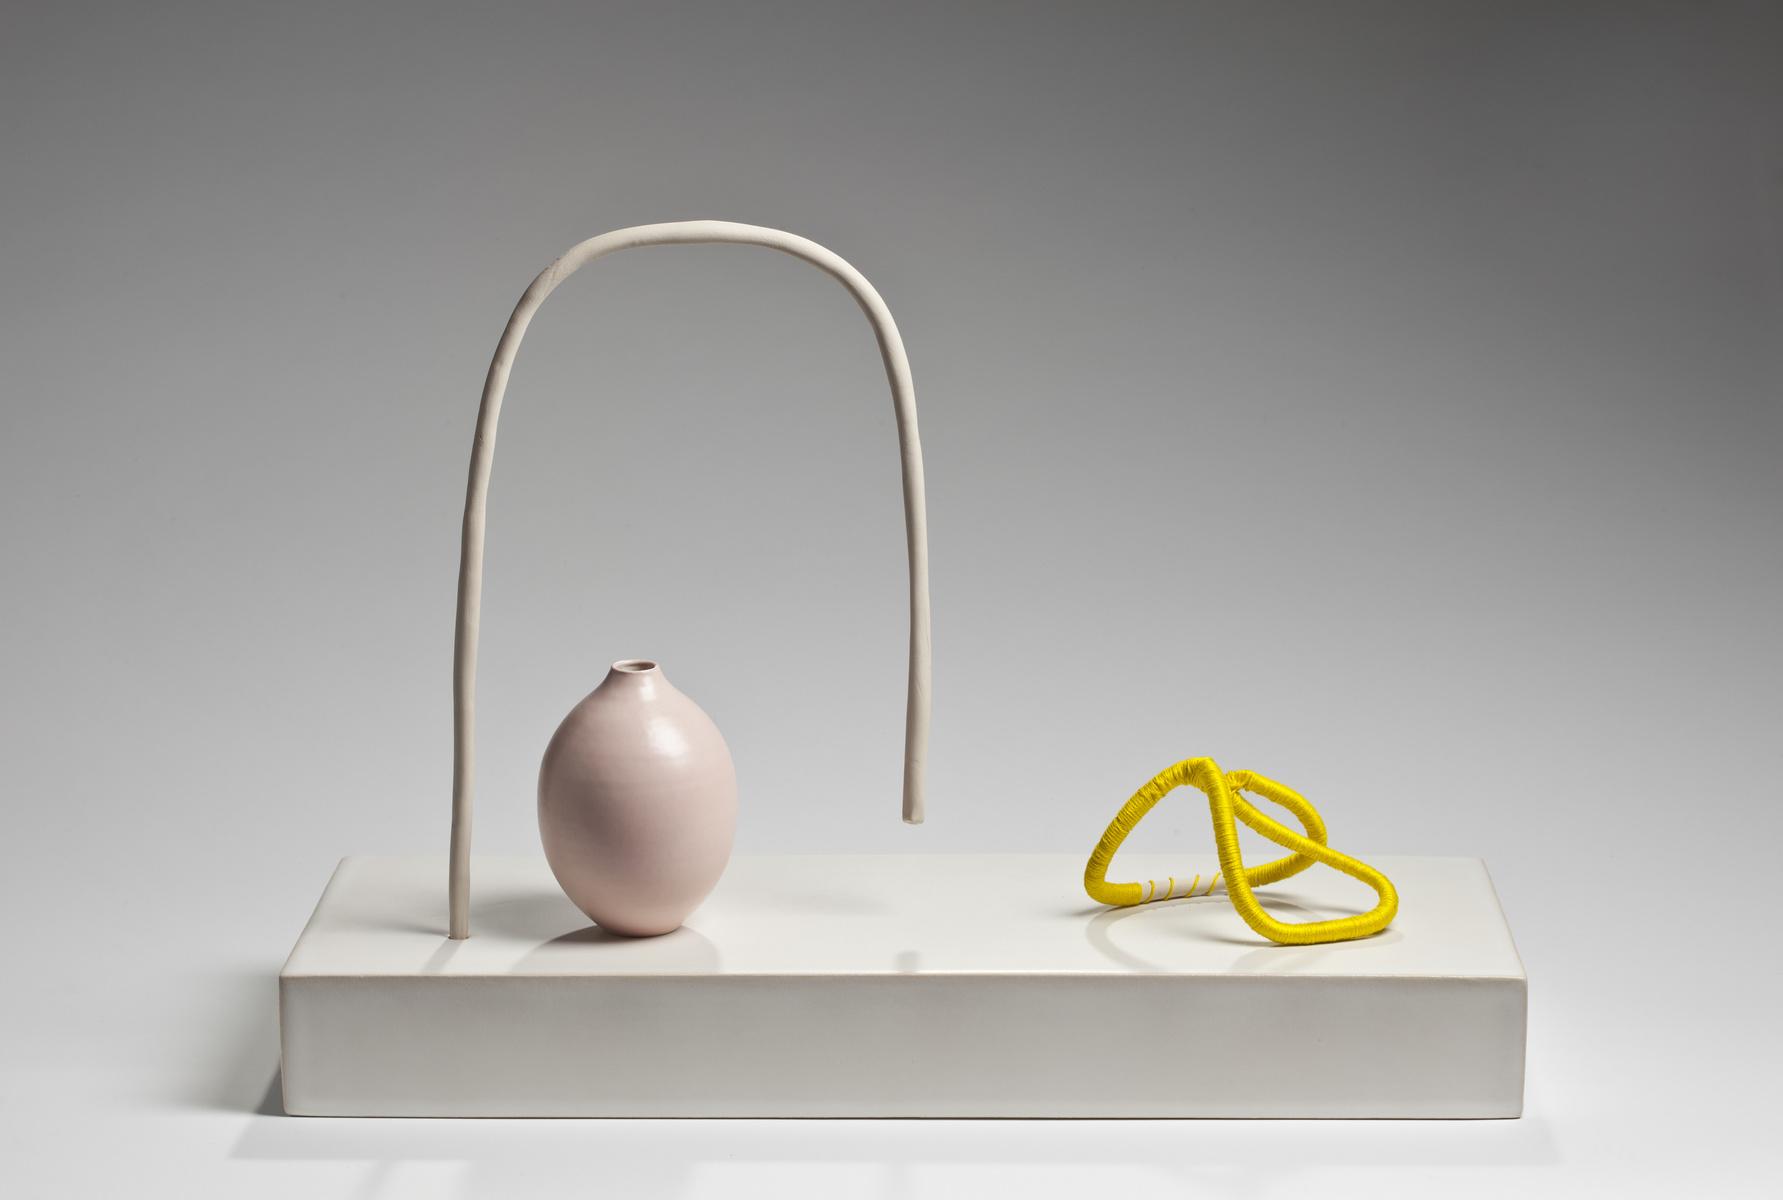 installation de céramique contemporaine